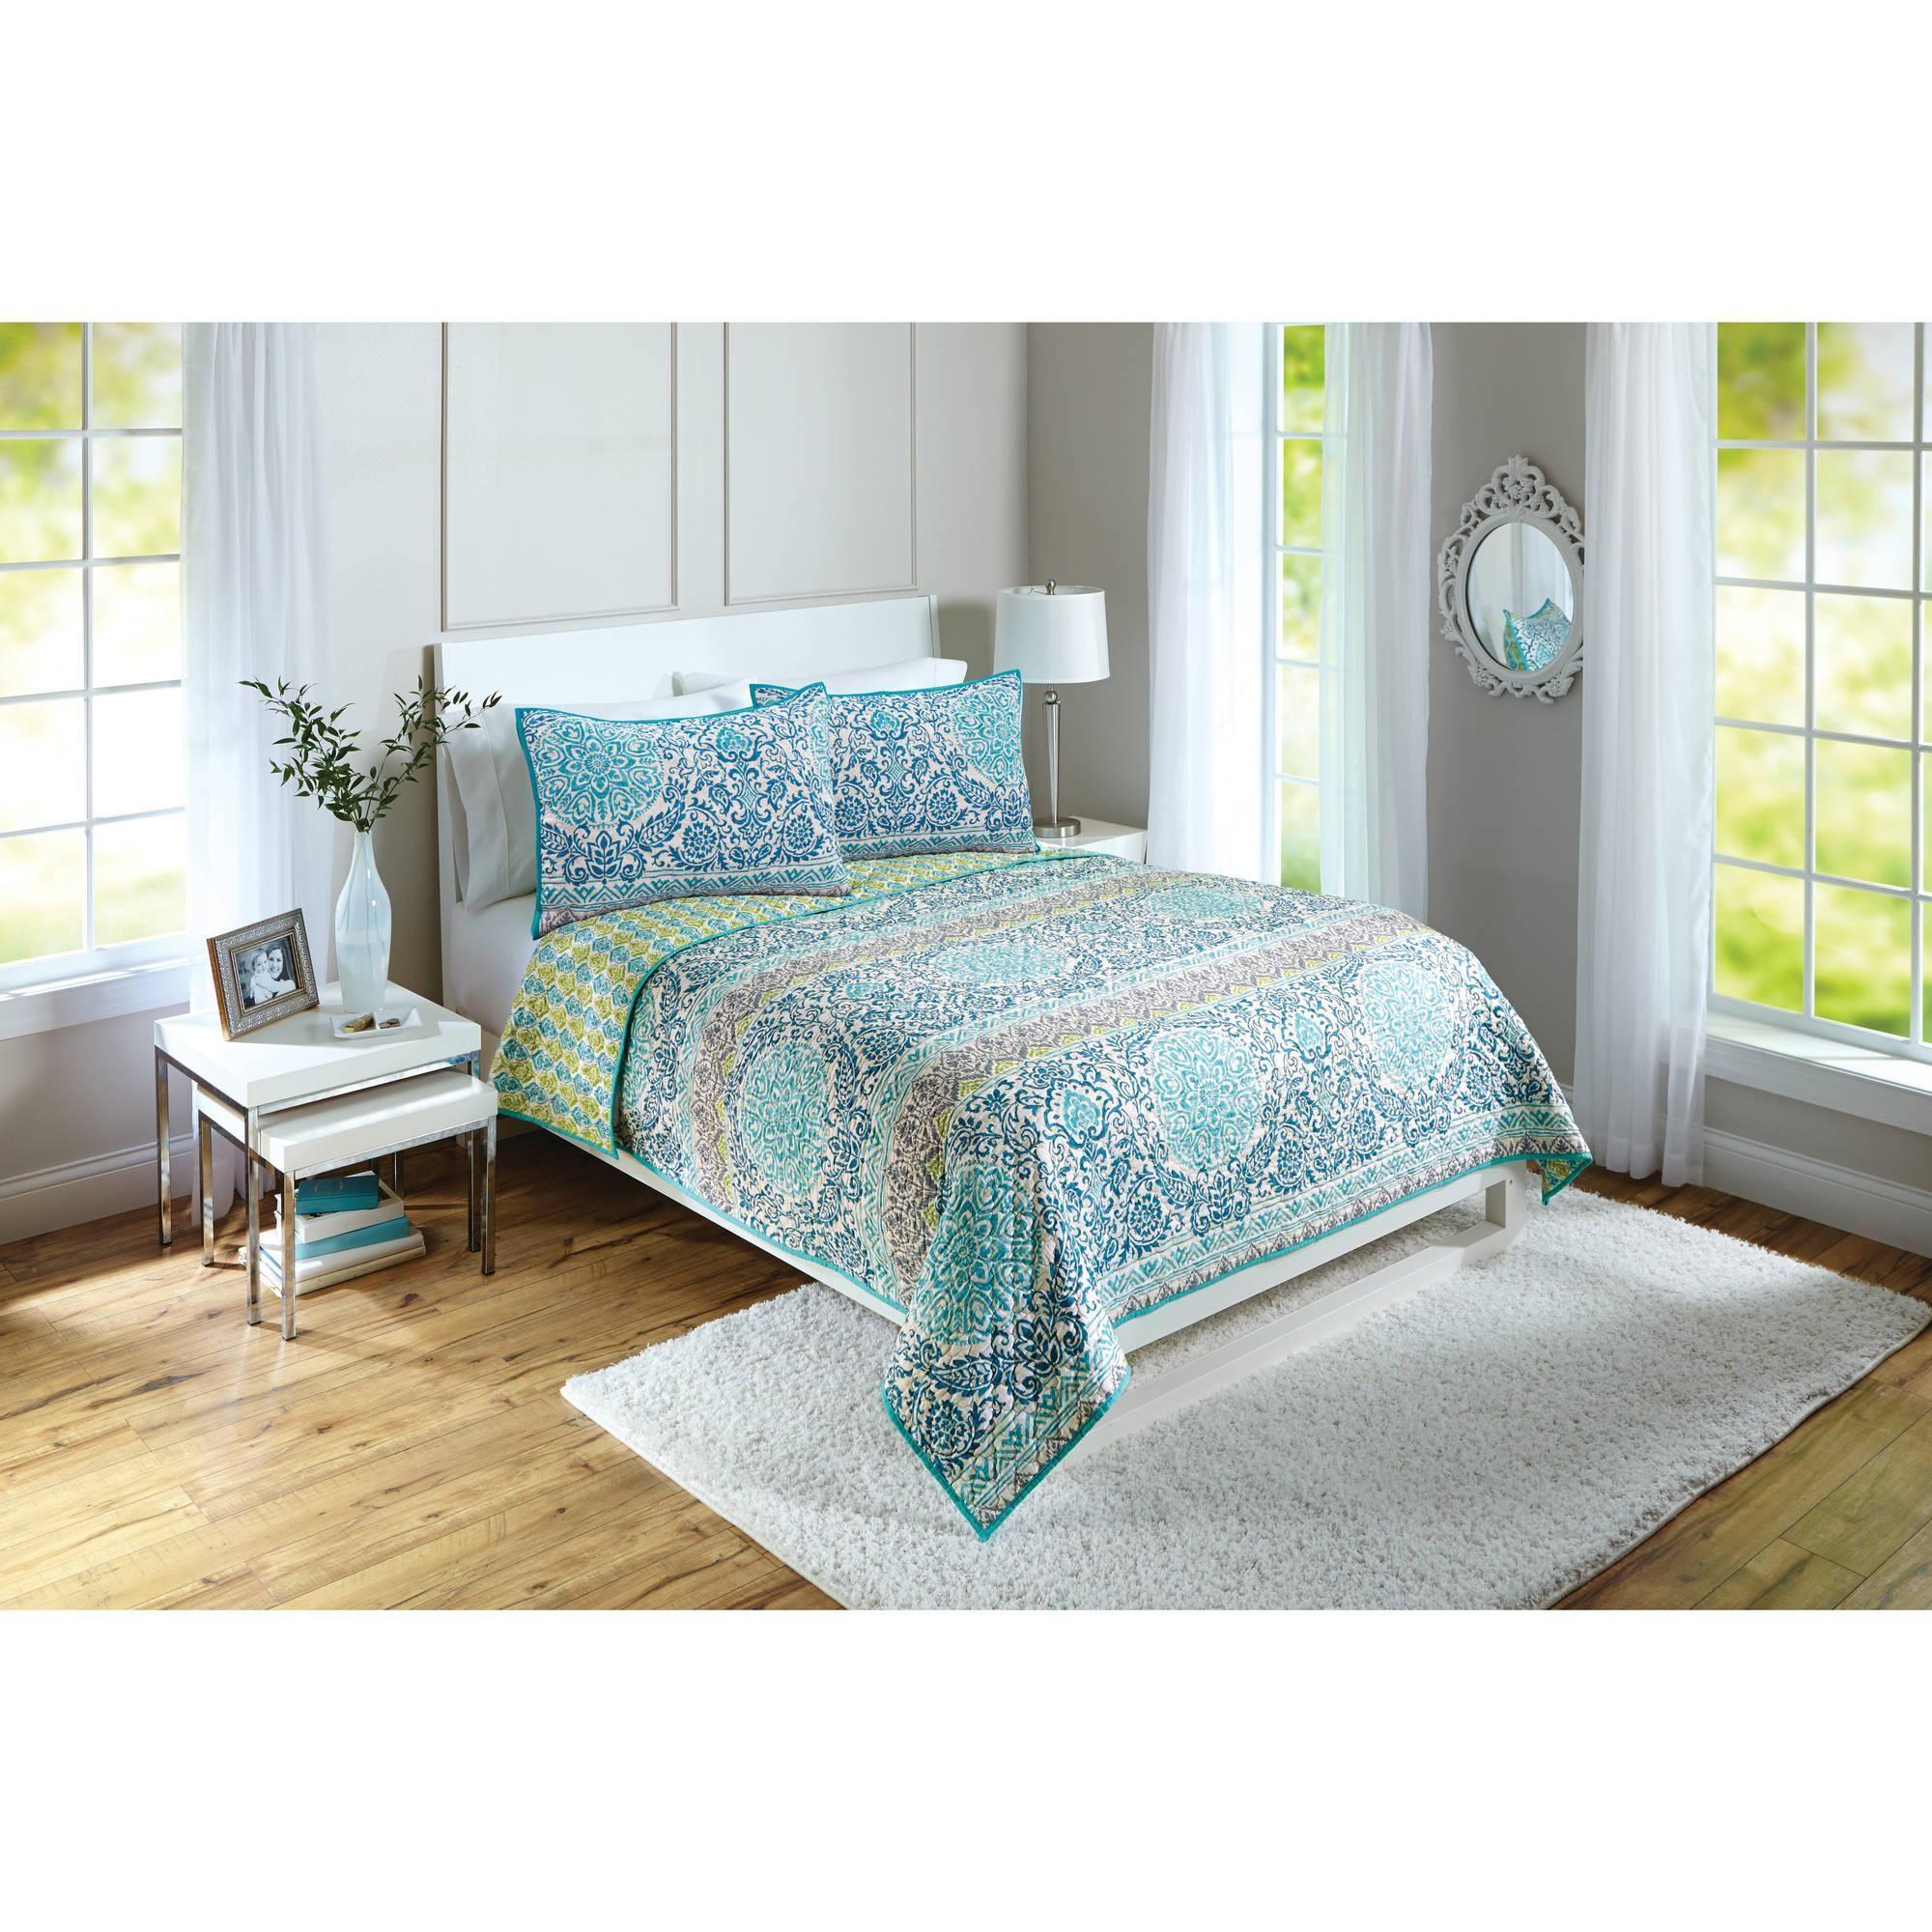 Better Homes And Gardens Layered Medallion Quilt Walmart Com Home New Room Bedroom Inspiration Boho